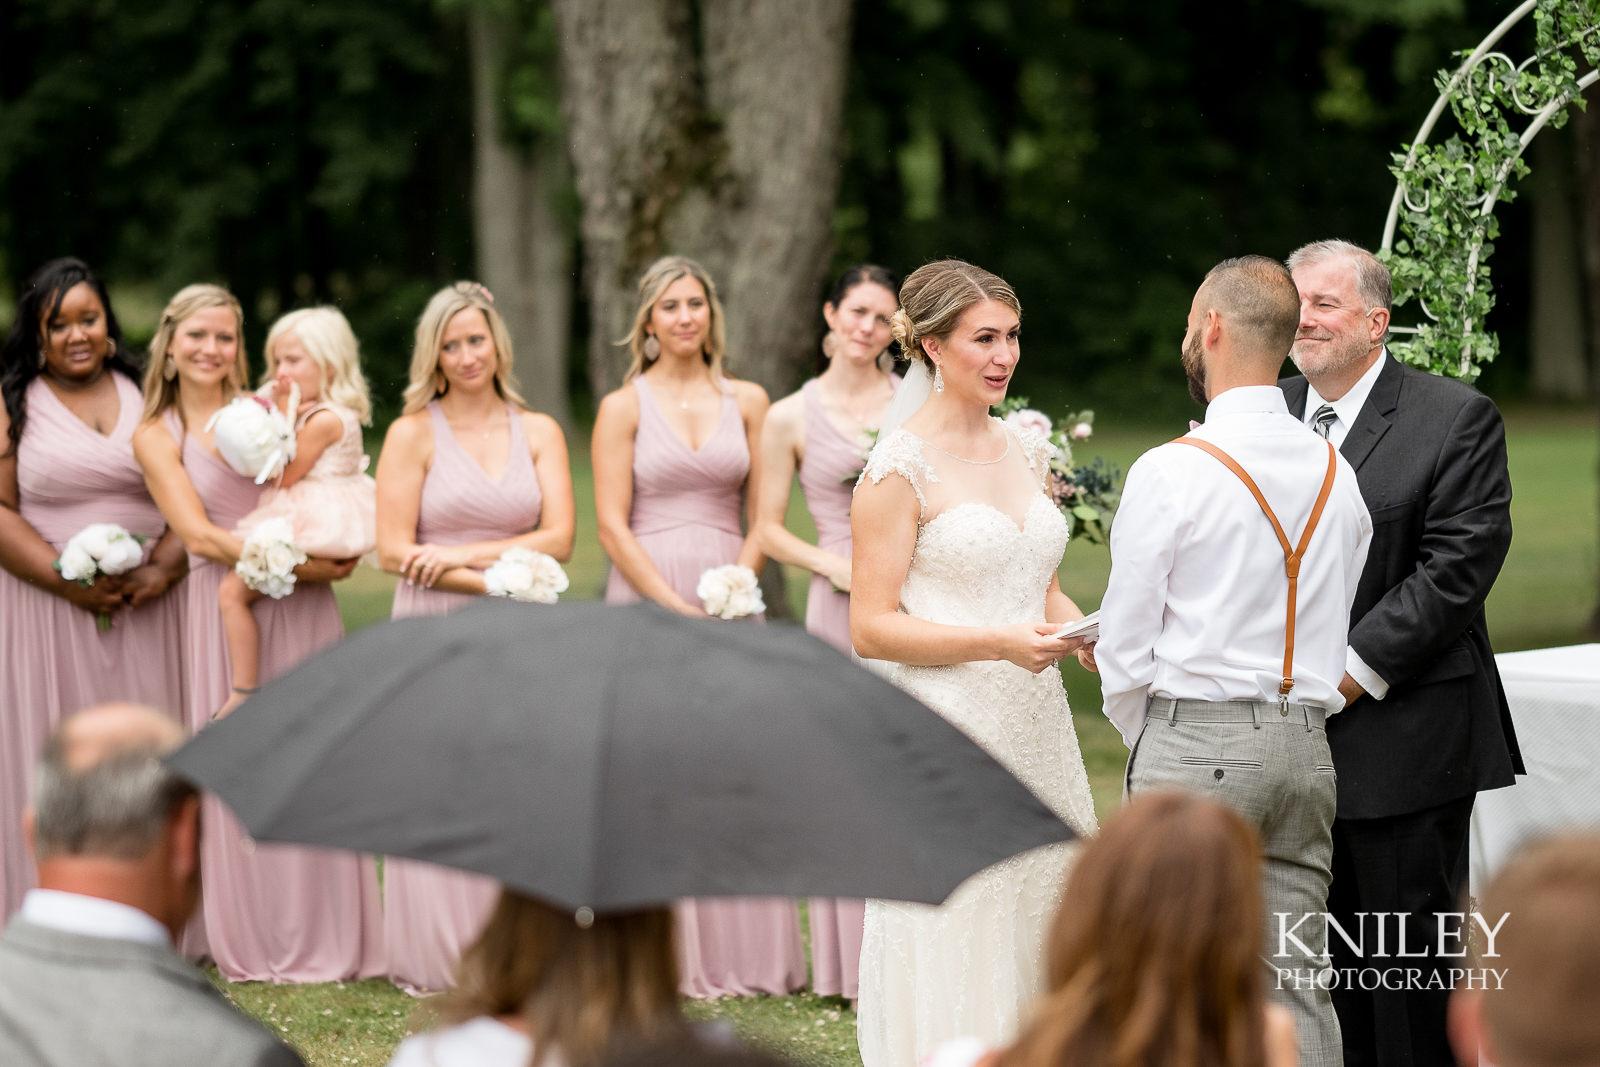 050 - Ontario Golf Club Wedding Pictures - XT2A6715.jpg